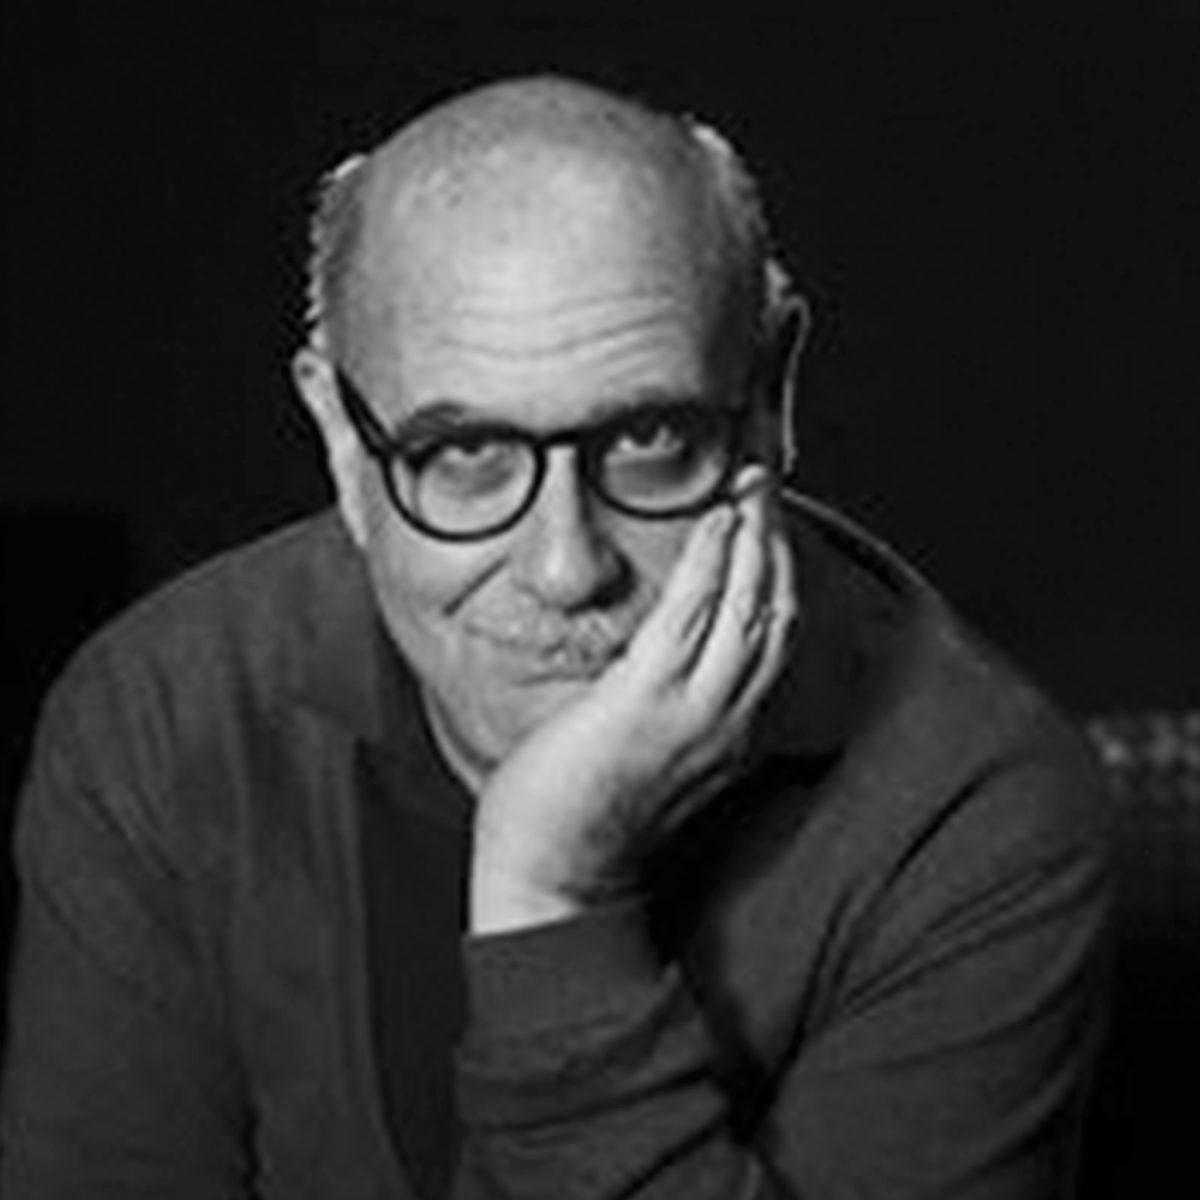 Alberto Ísola